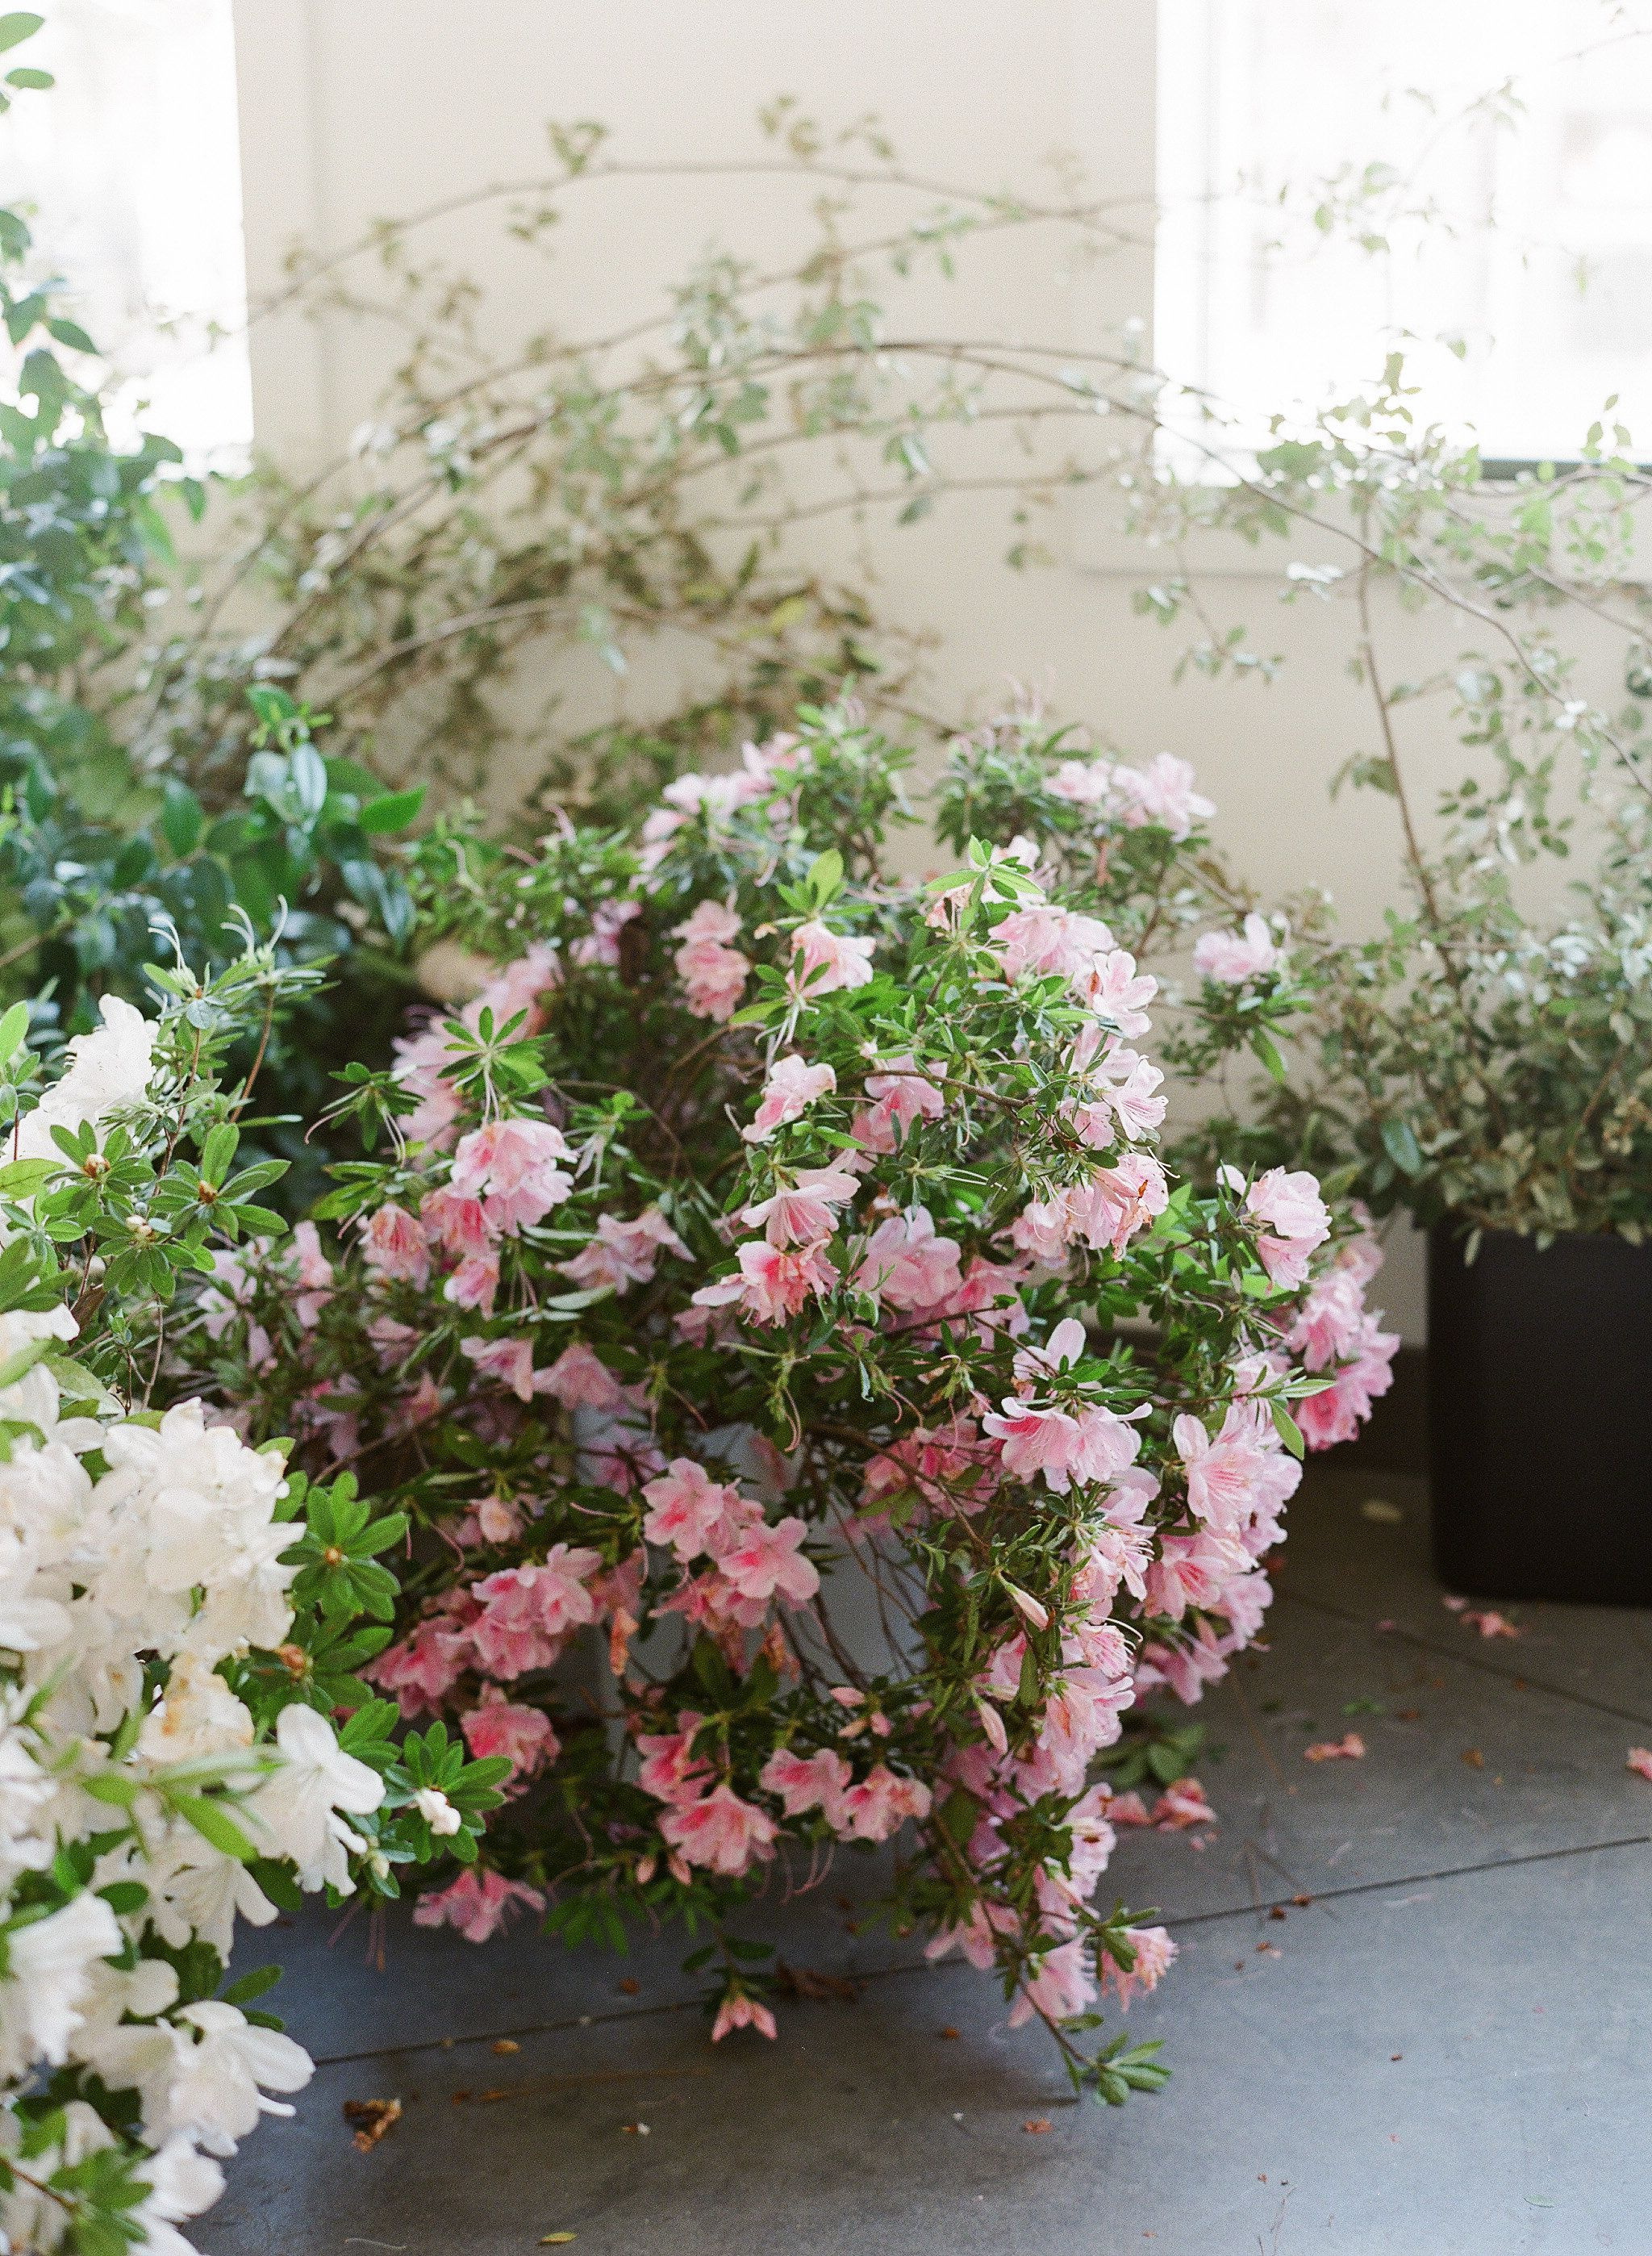 Foraged Azalea Blooms in Charleston for the Ariella Chezar